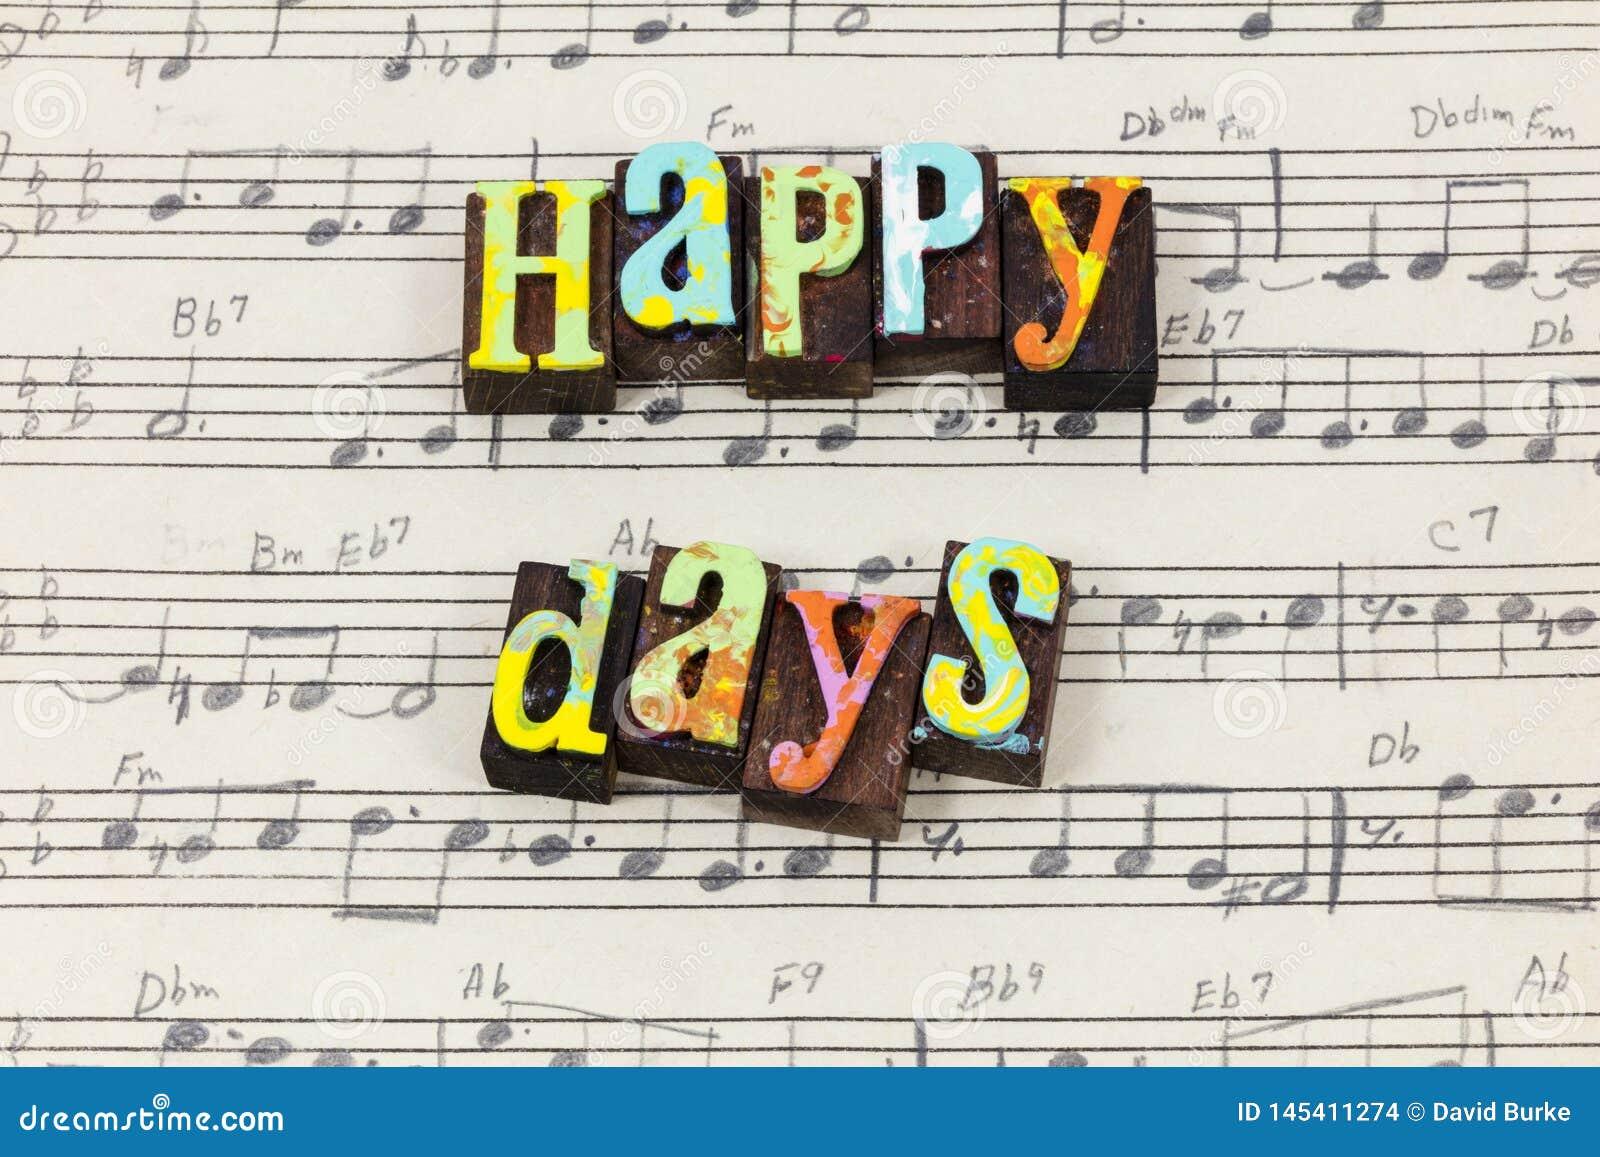 Happy days here again day enjoy life love music letterpress type